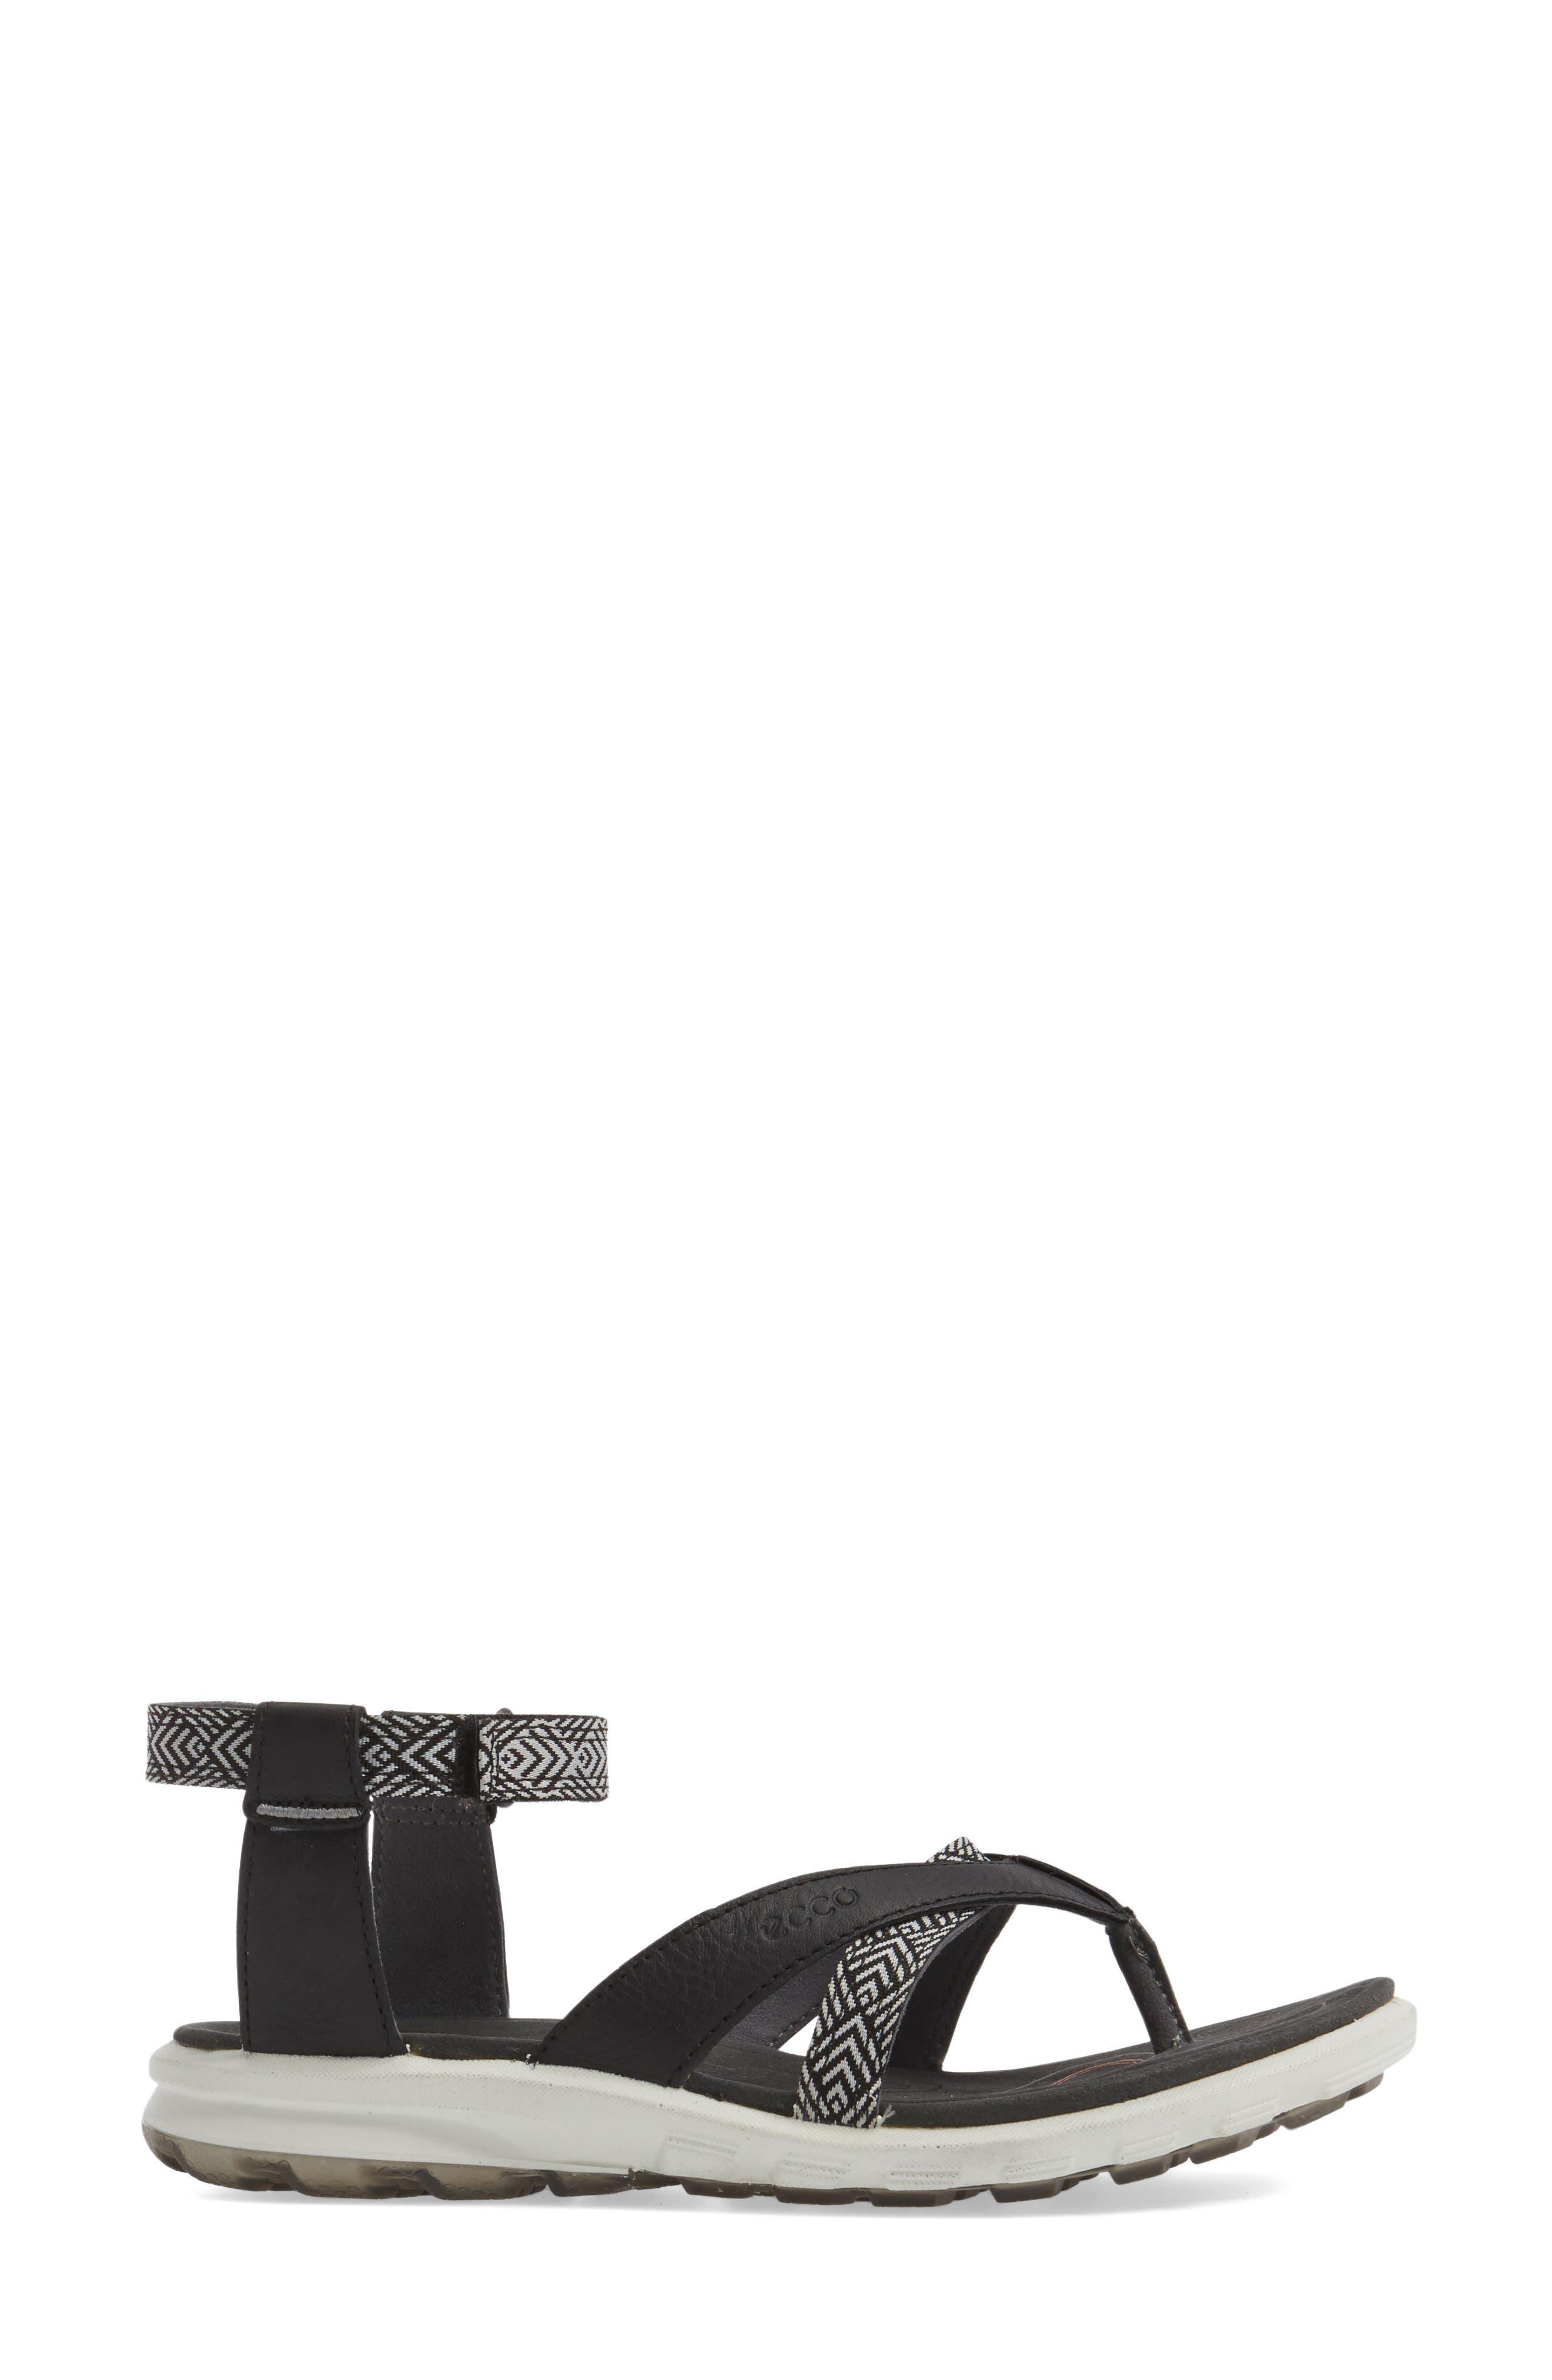 Cruise Sport Sandal,                             Alternate thumbnail 3, color,                             Black Leather